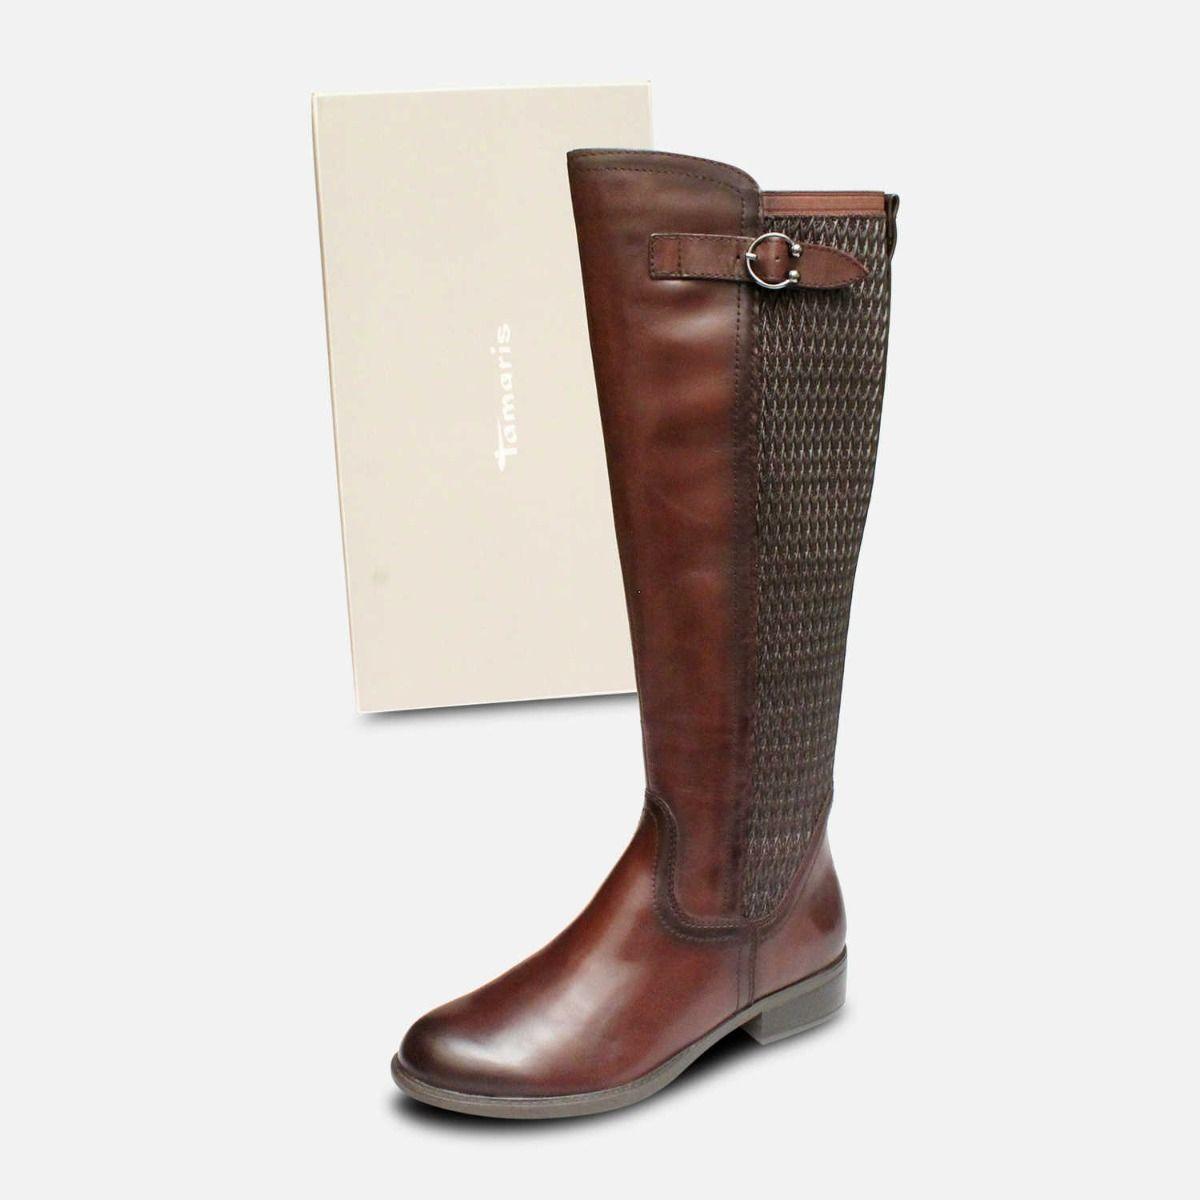 Tamaris Full Length Cafe Brown Elasticated Zip Boots